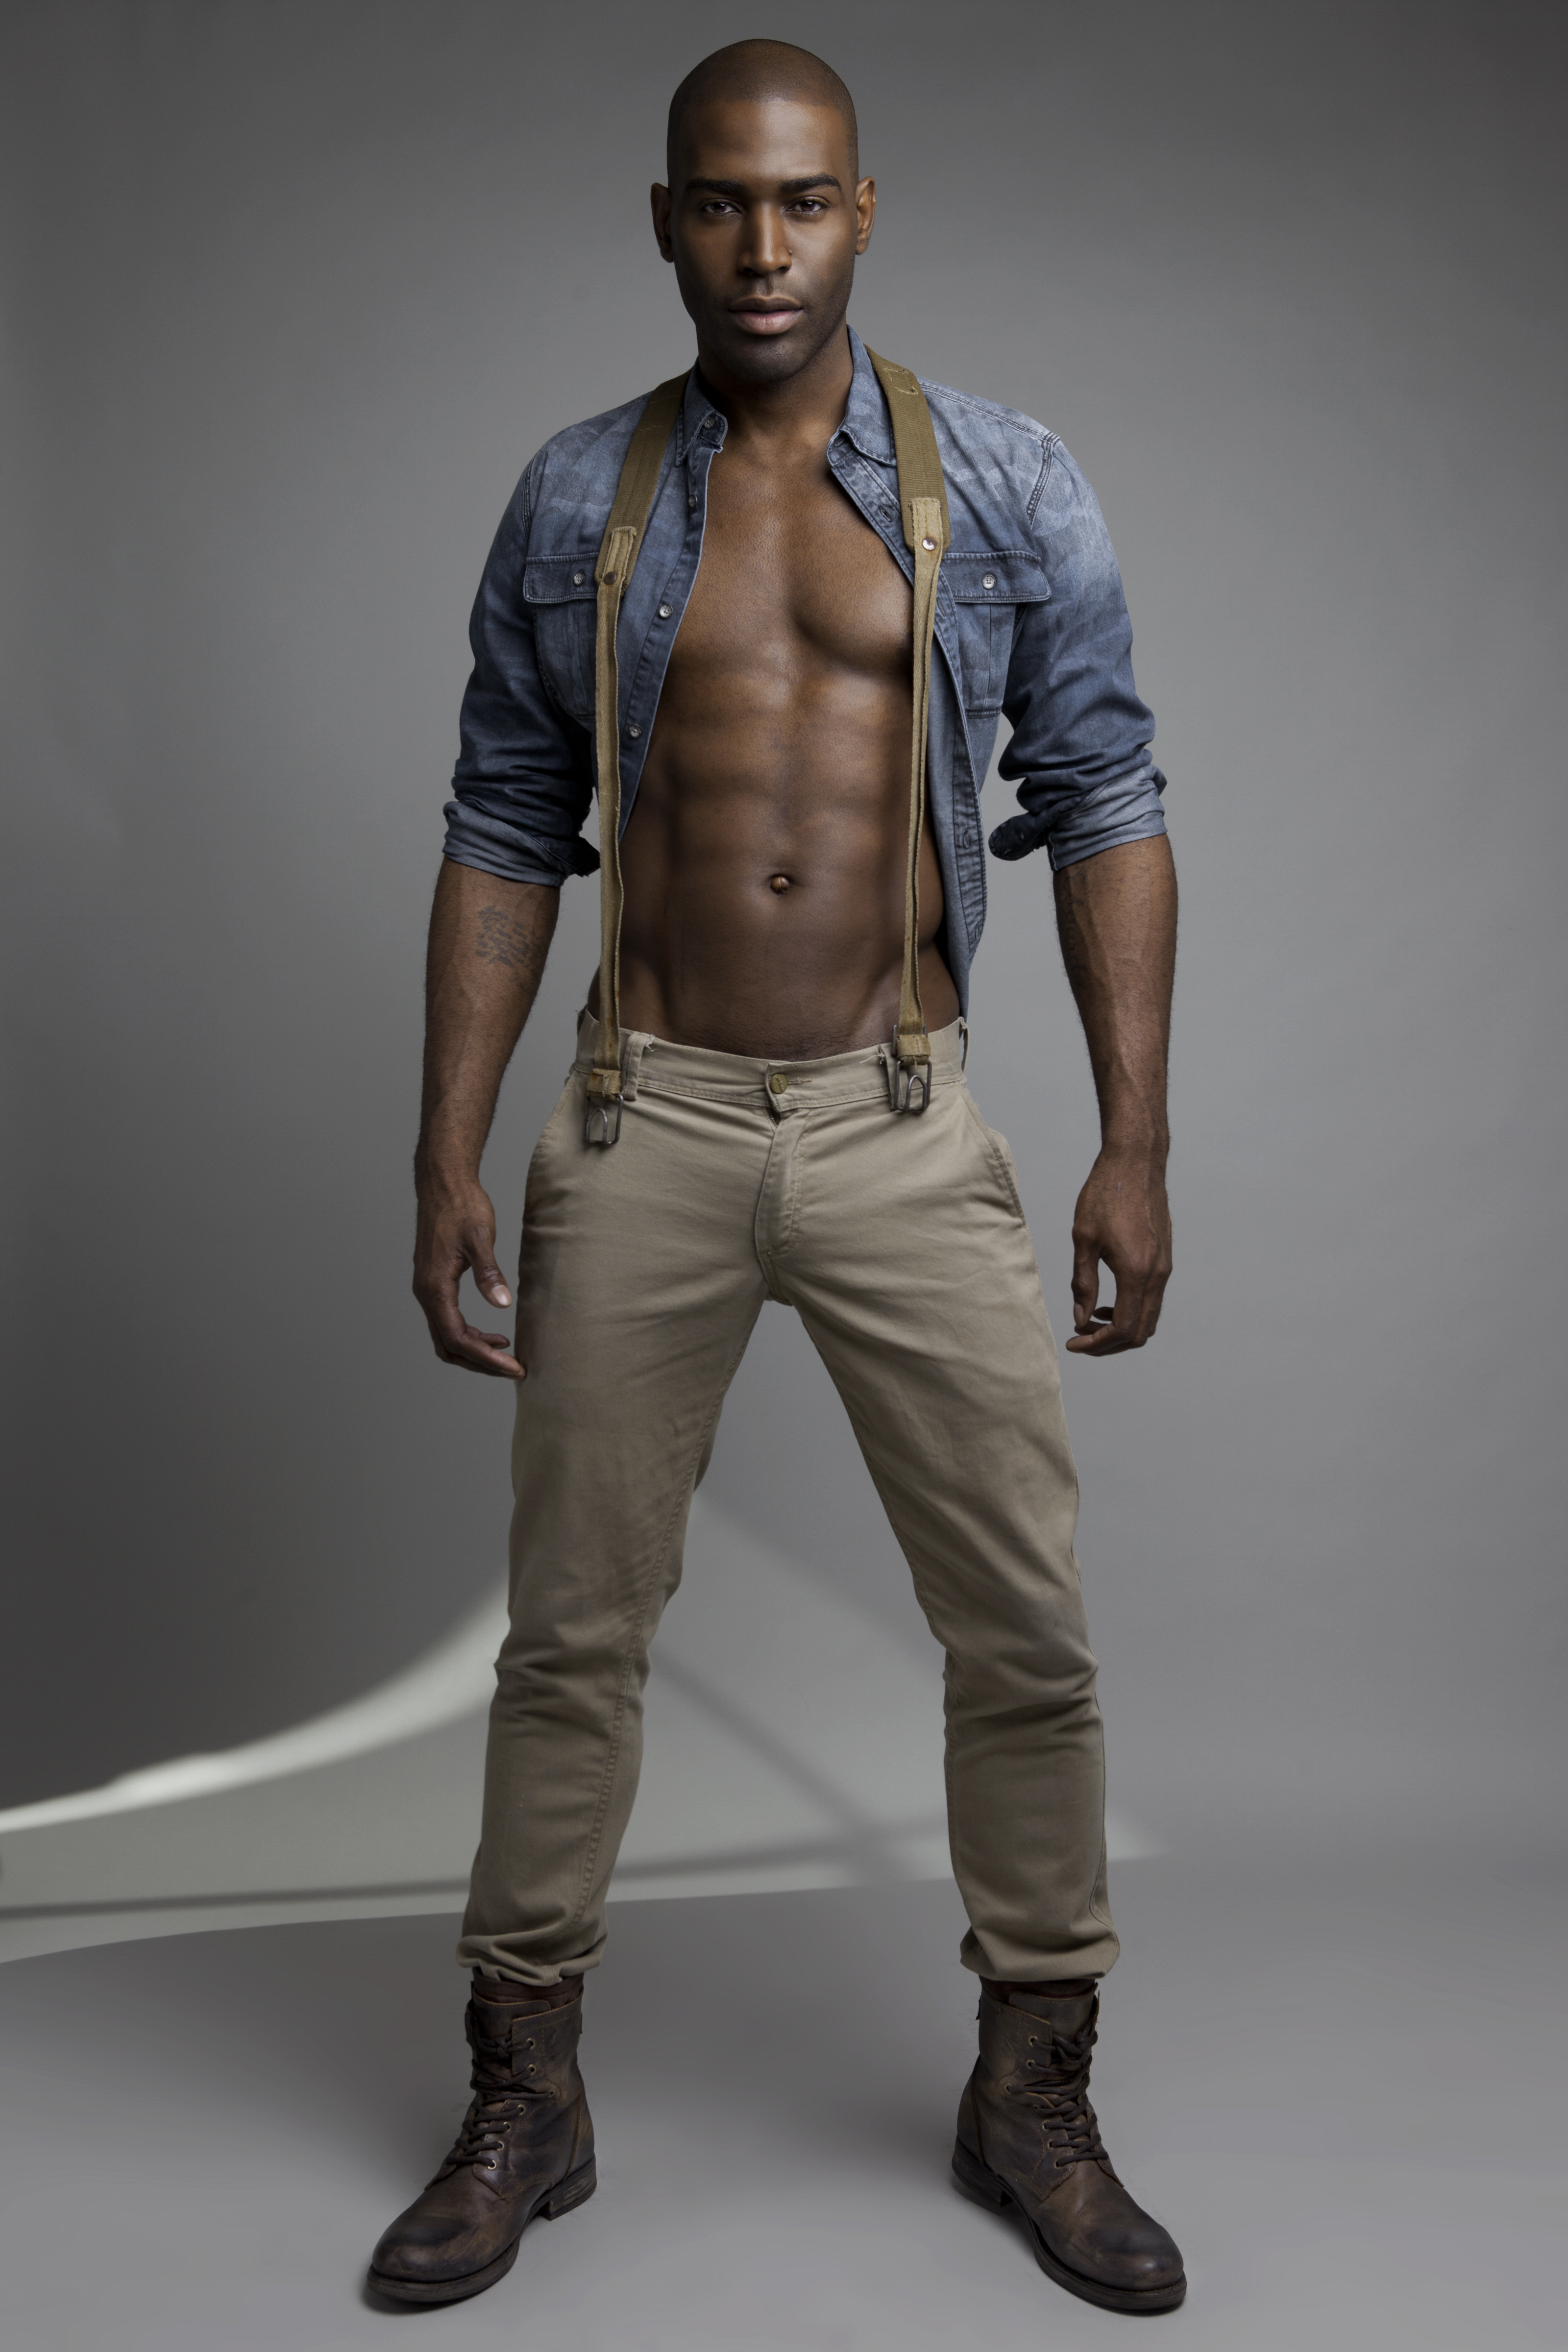 Karamo Brown_Karamo_Television Host_OWN_Oprah Winfery Network Host_Gay Father_ Black Gay Father_Blac